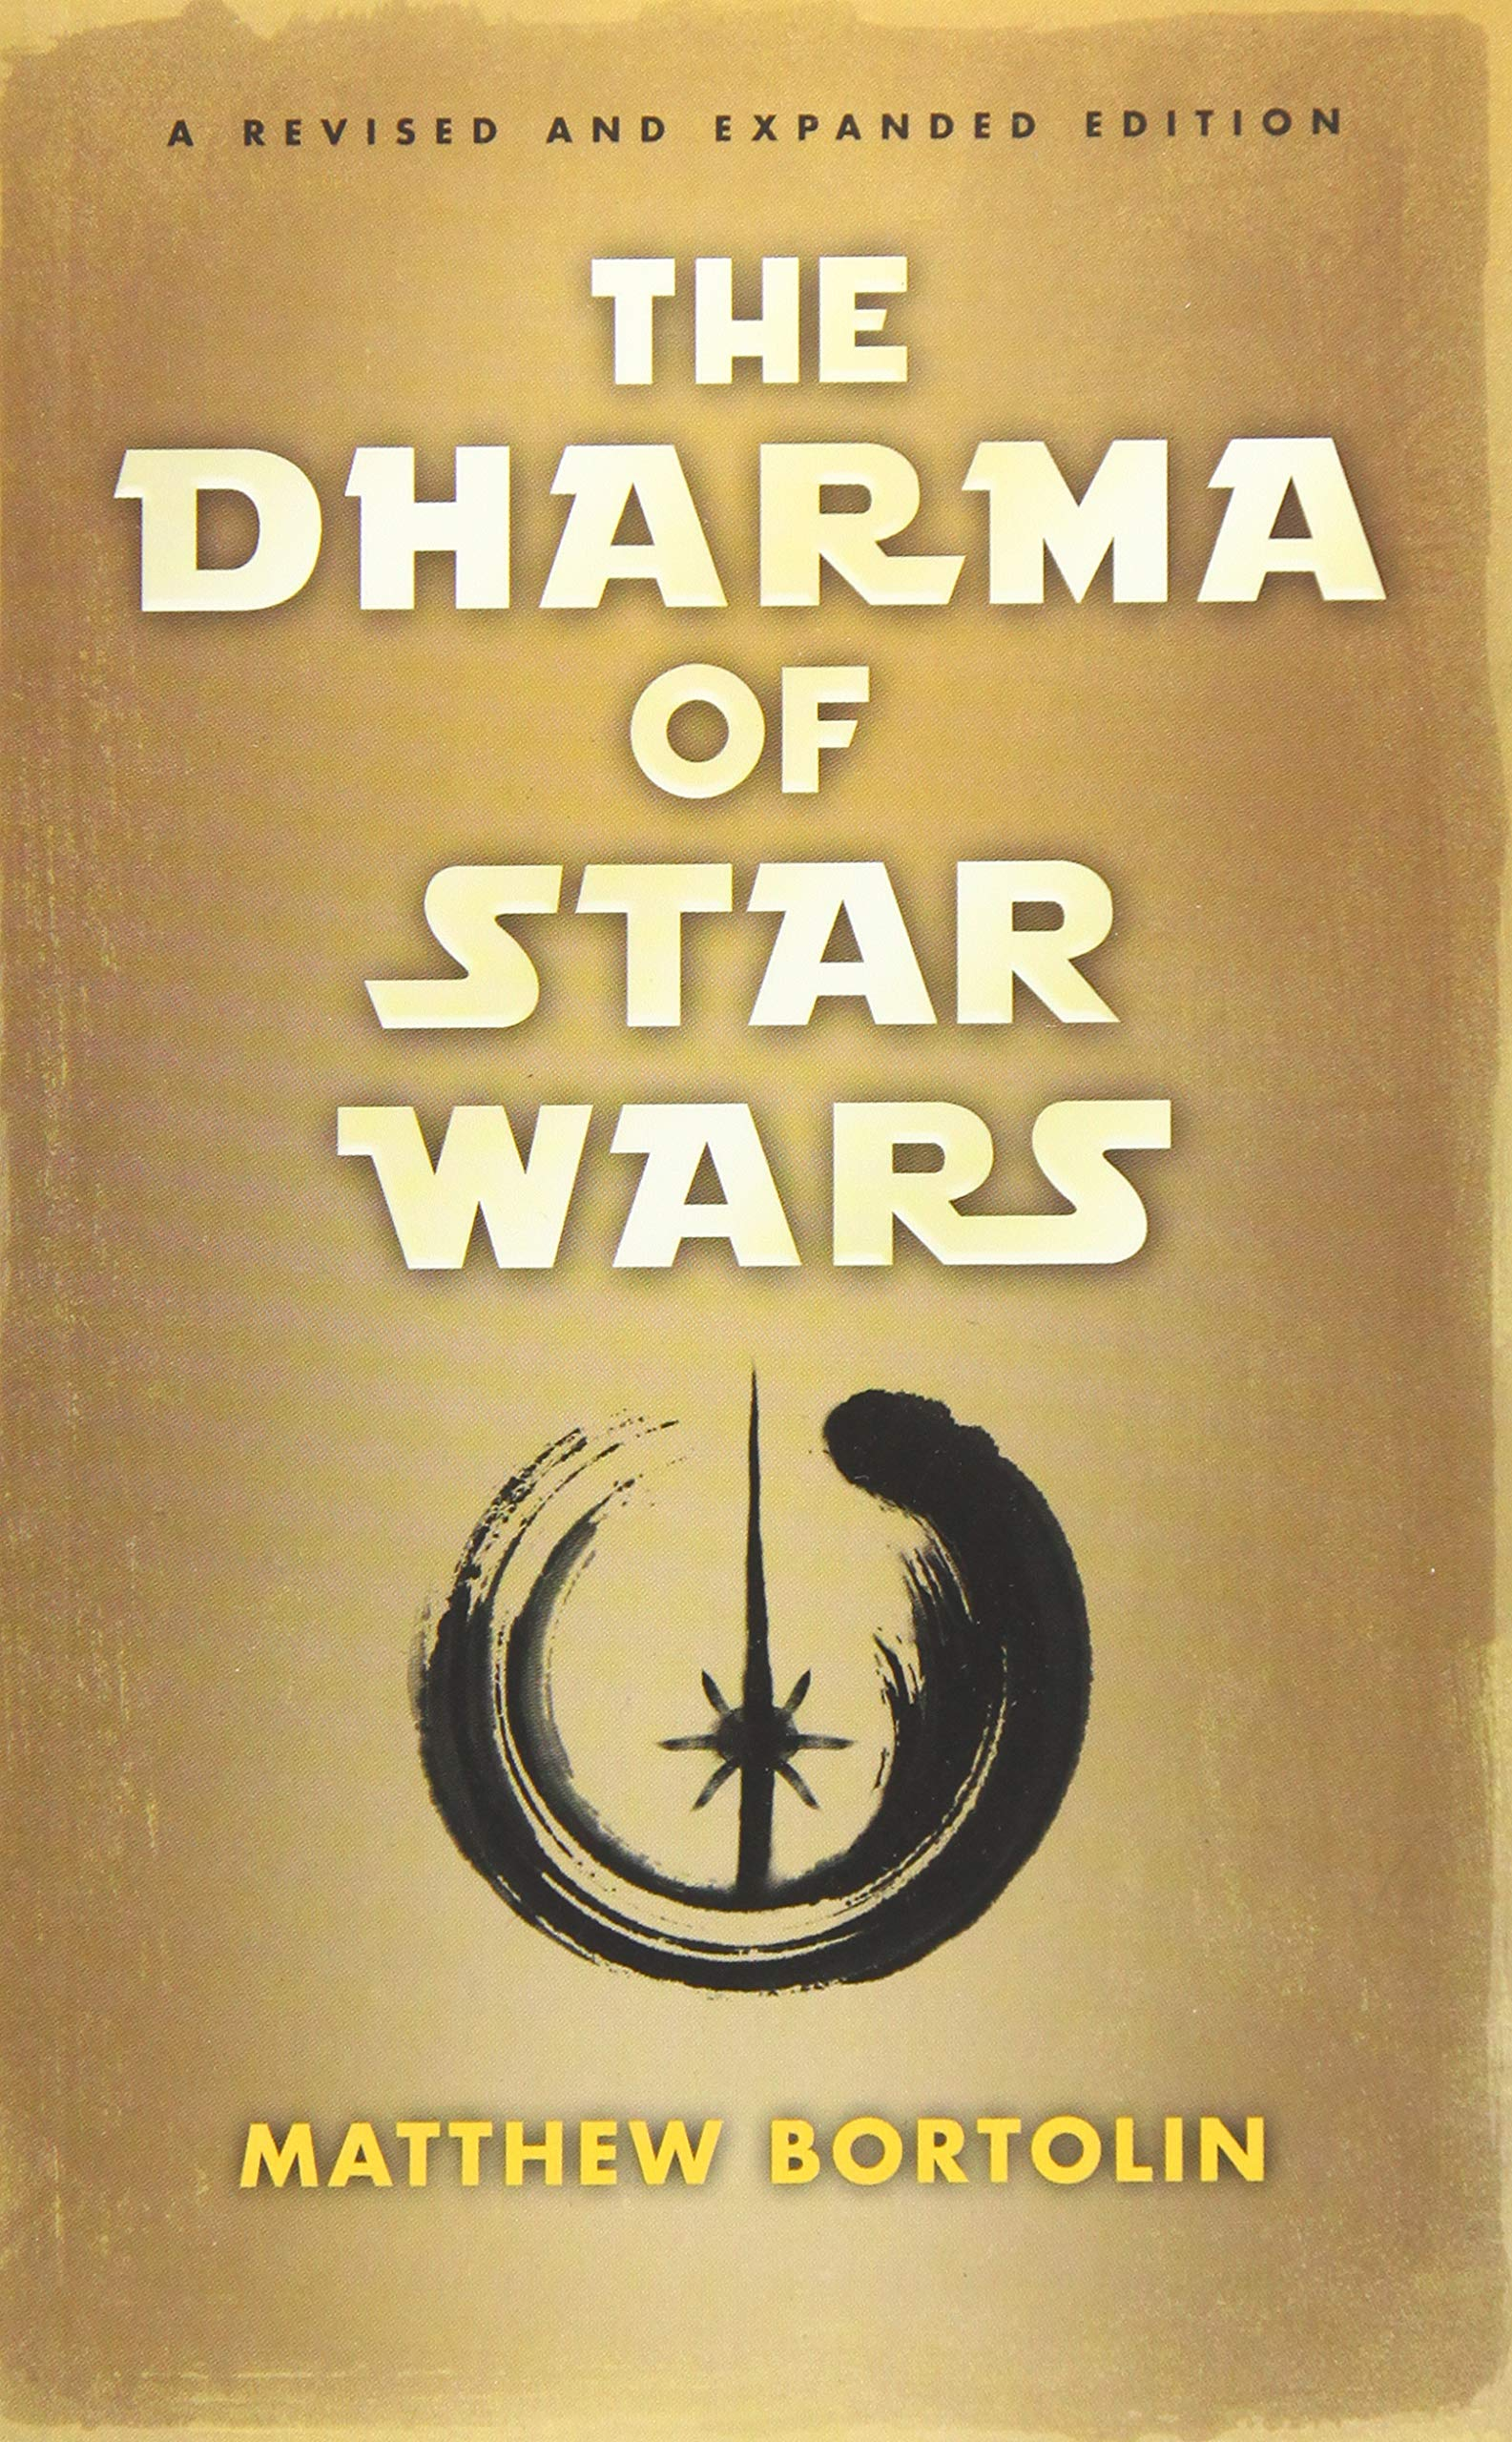 The Dharma of Star Wars: Matthew Bortolin: 9781614292869 ...